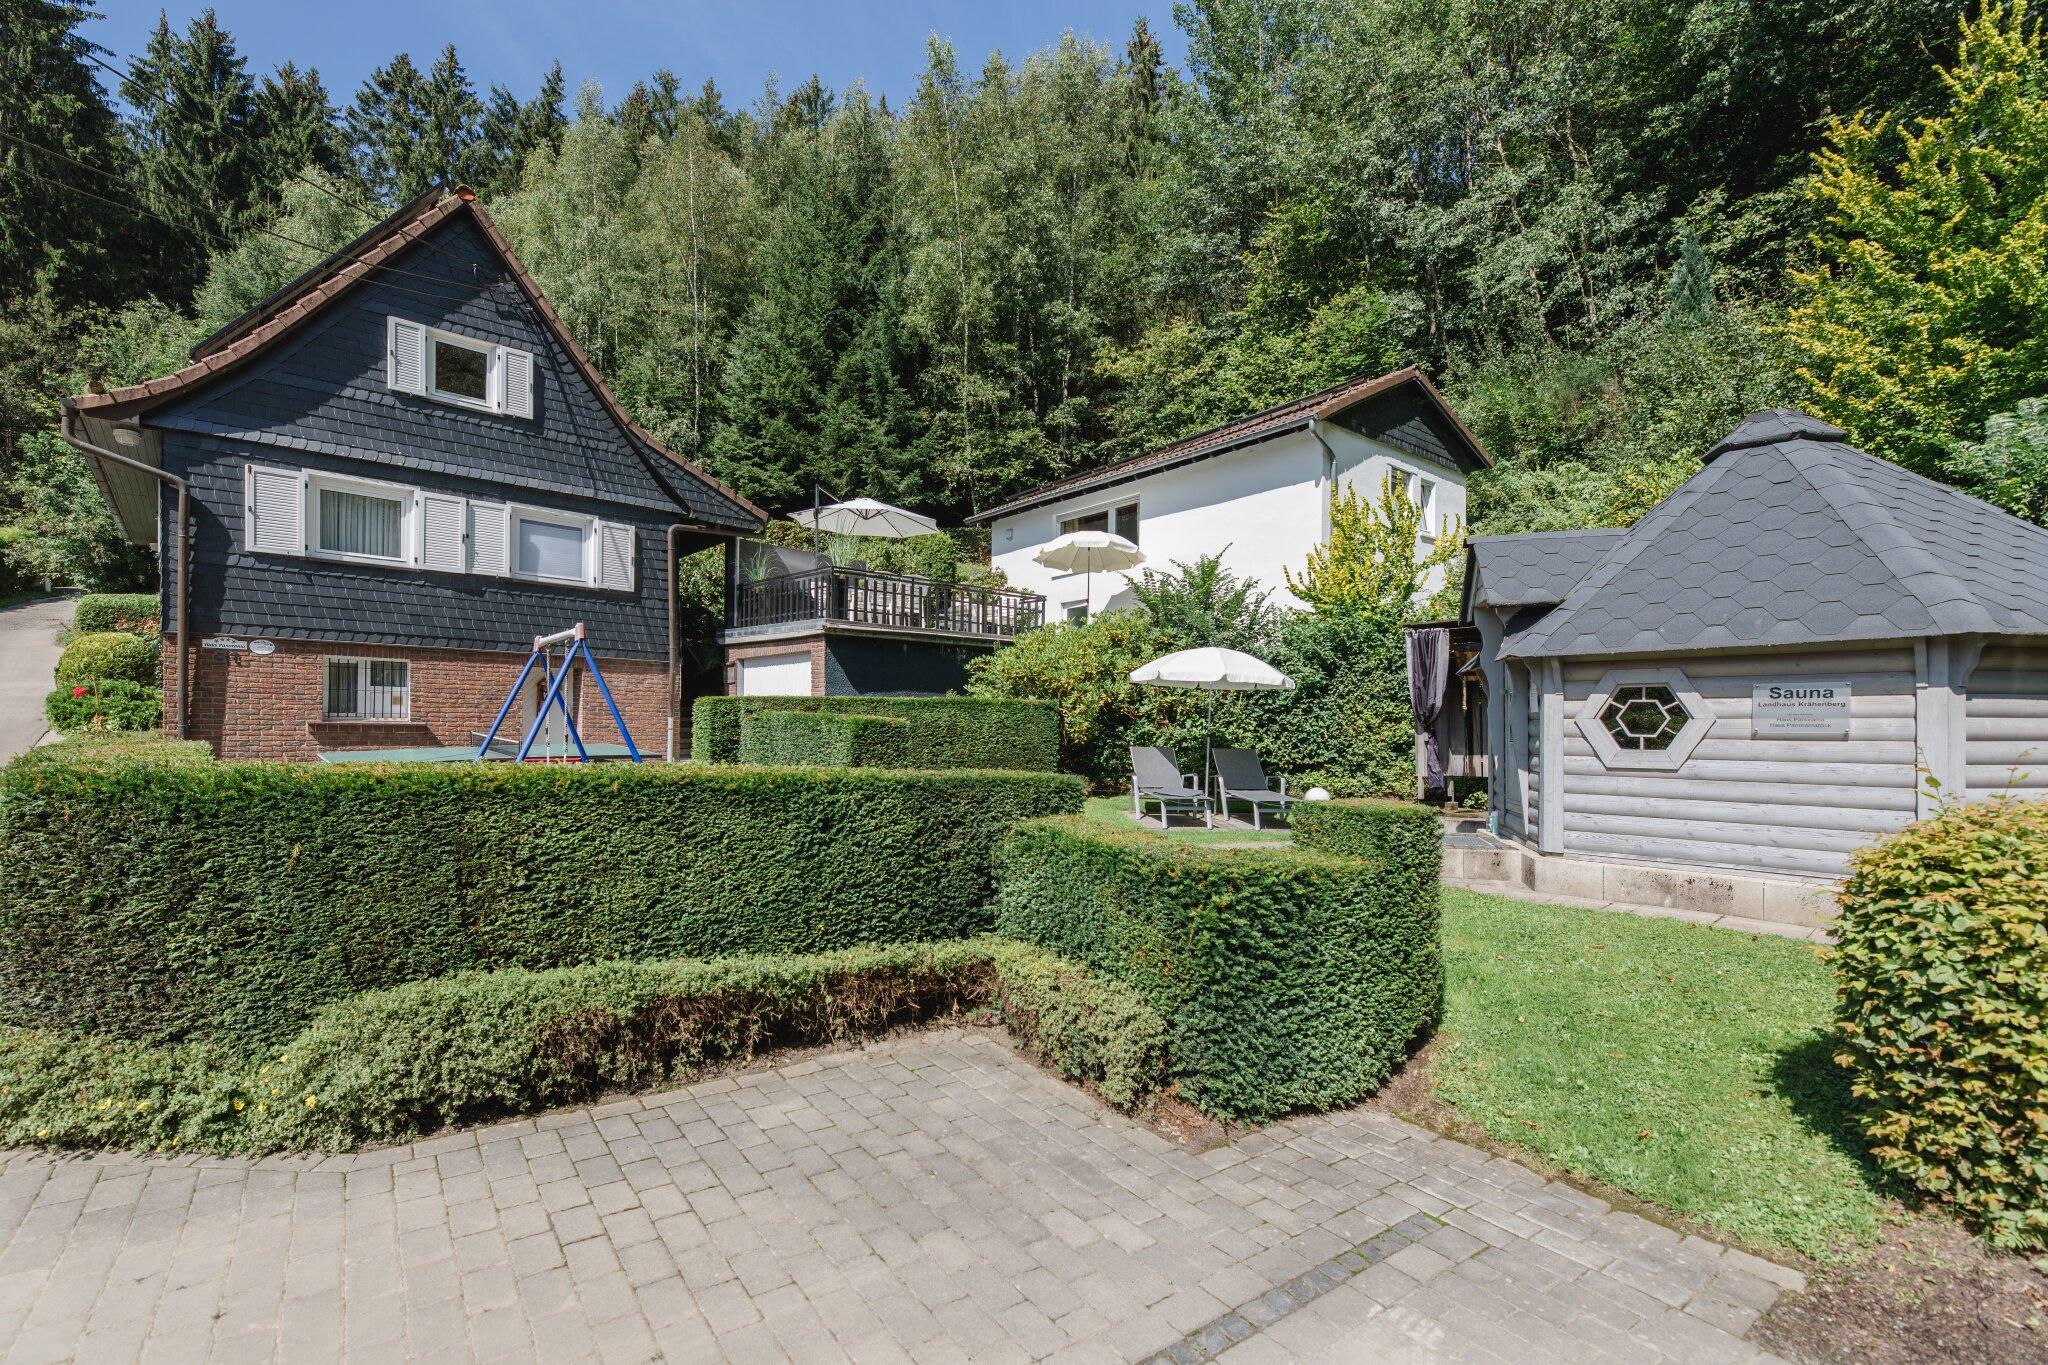 haus panoramablick in eslohe nordrhein westfalen wilma tillmann. Black Bedroom Furniture Sets. Home Design Ideas